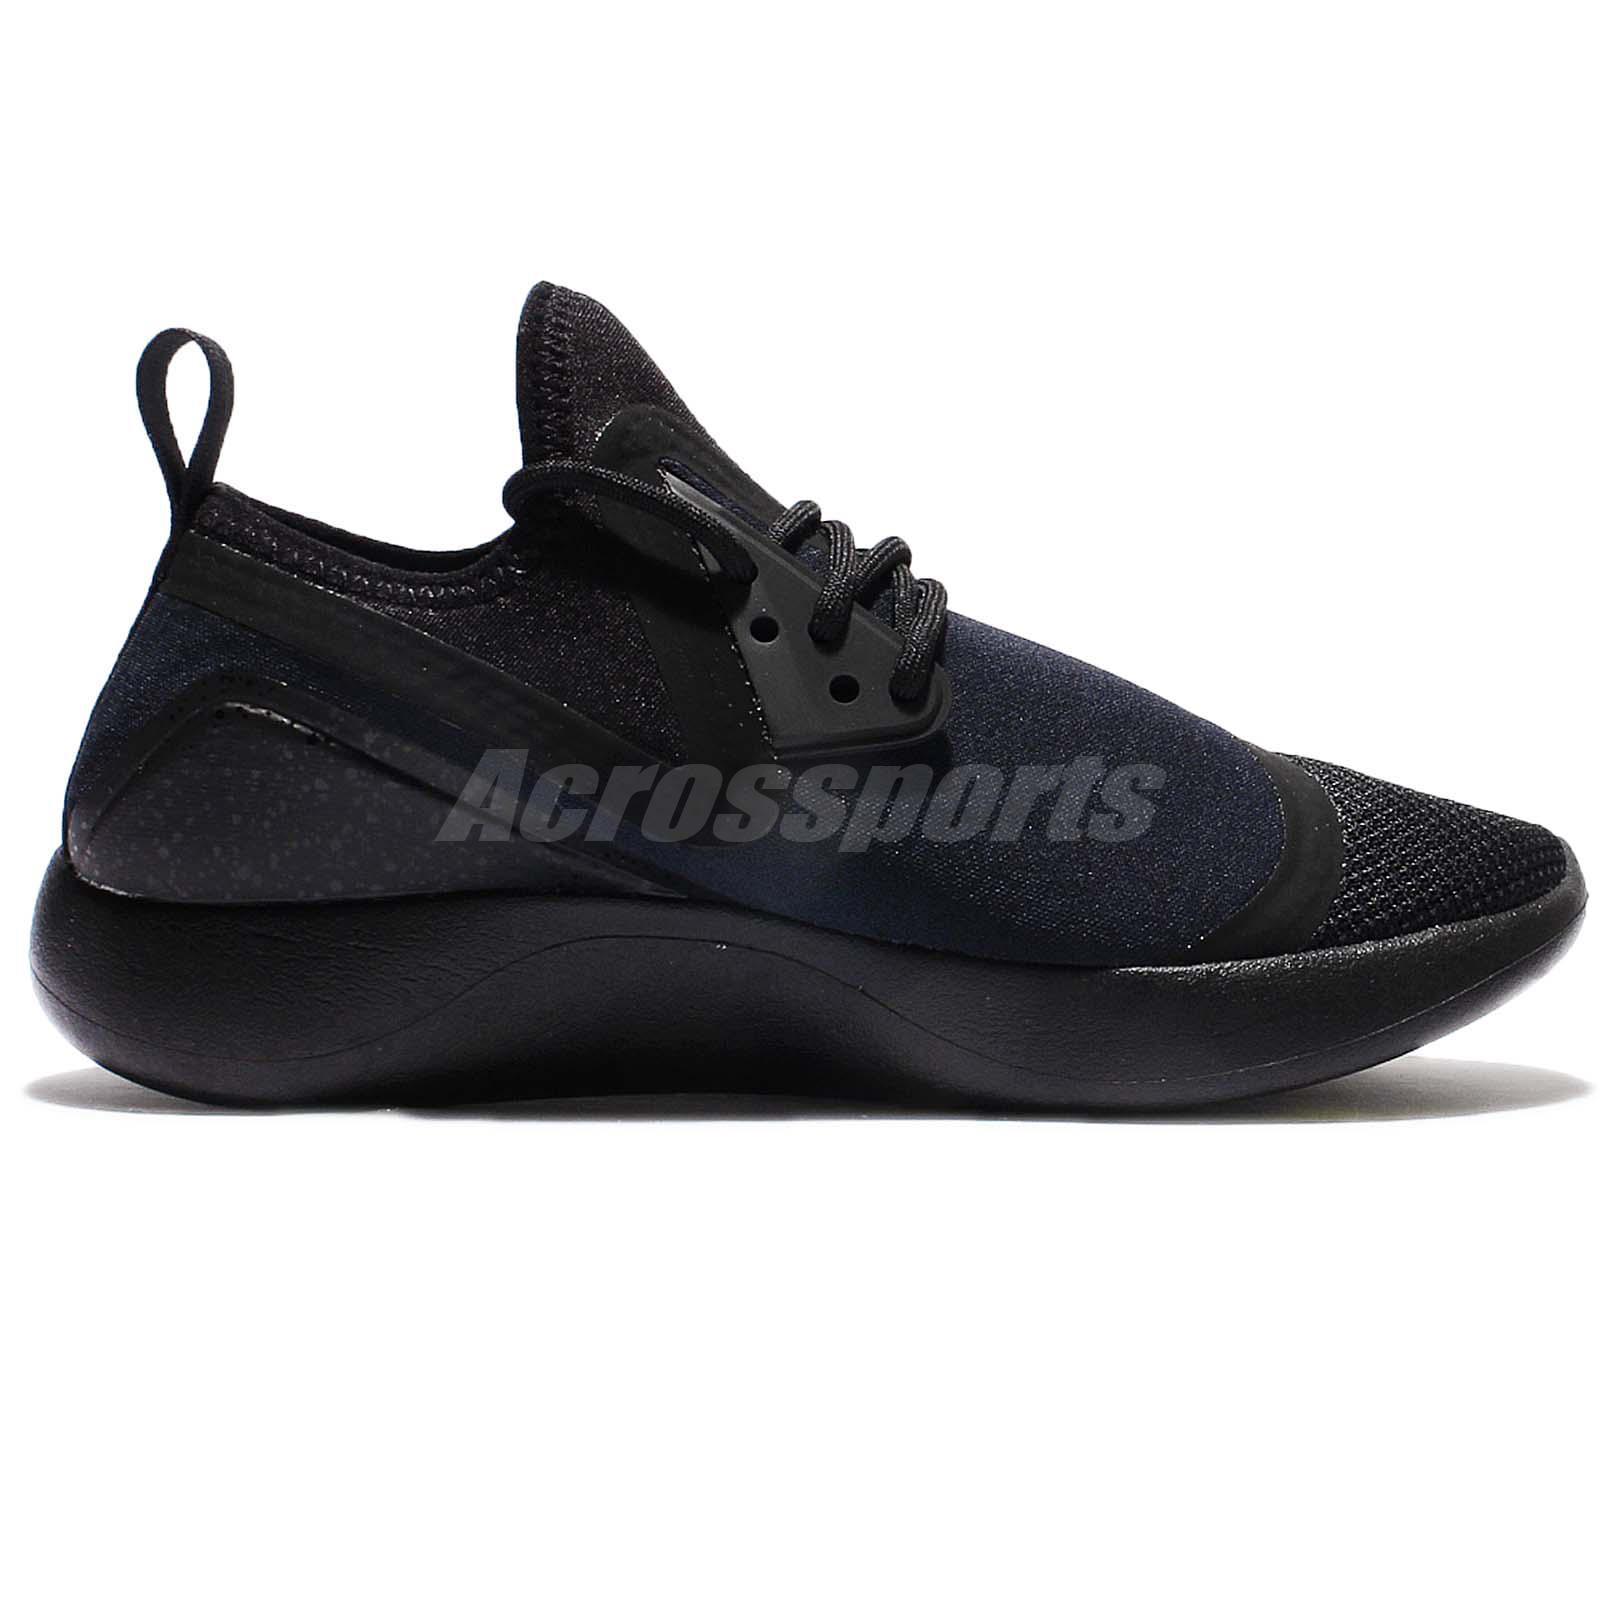 NEW NIKE LUNARCHARGE ESSENTIAL Running Shoe 923619-007 Men sz 9.5 Black Obsidian